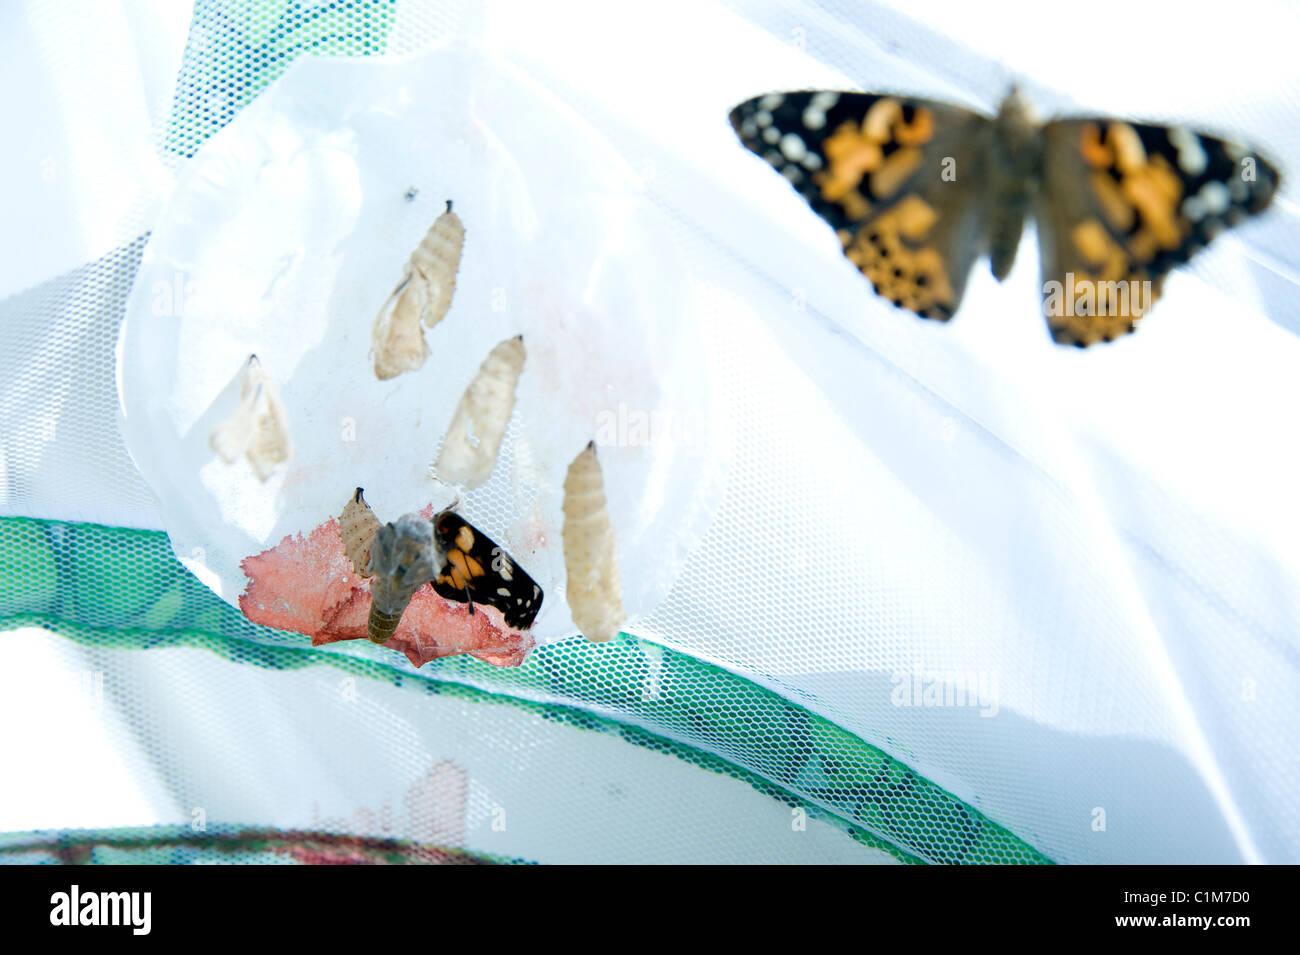 Breeding butterflies - Stock Image